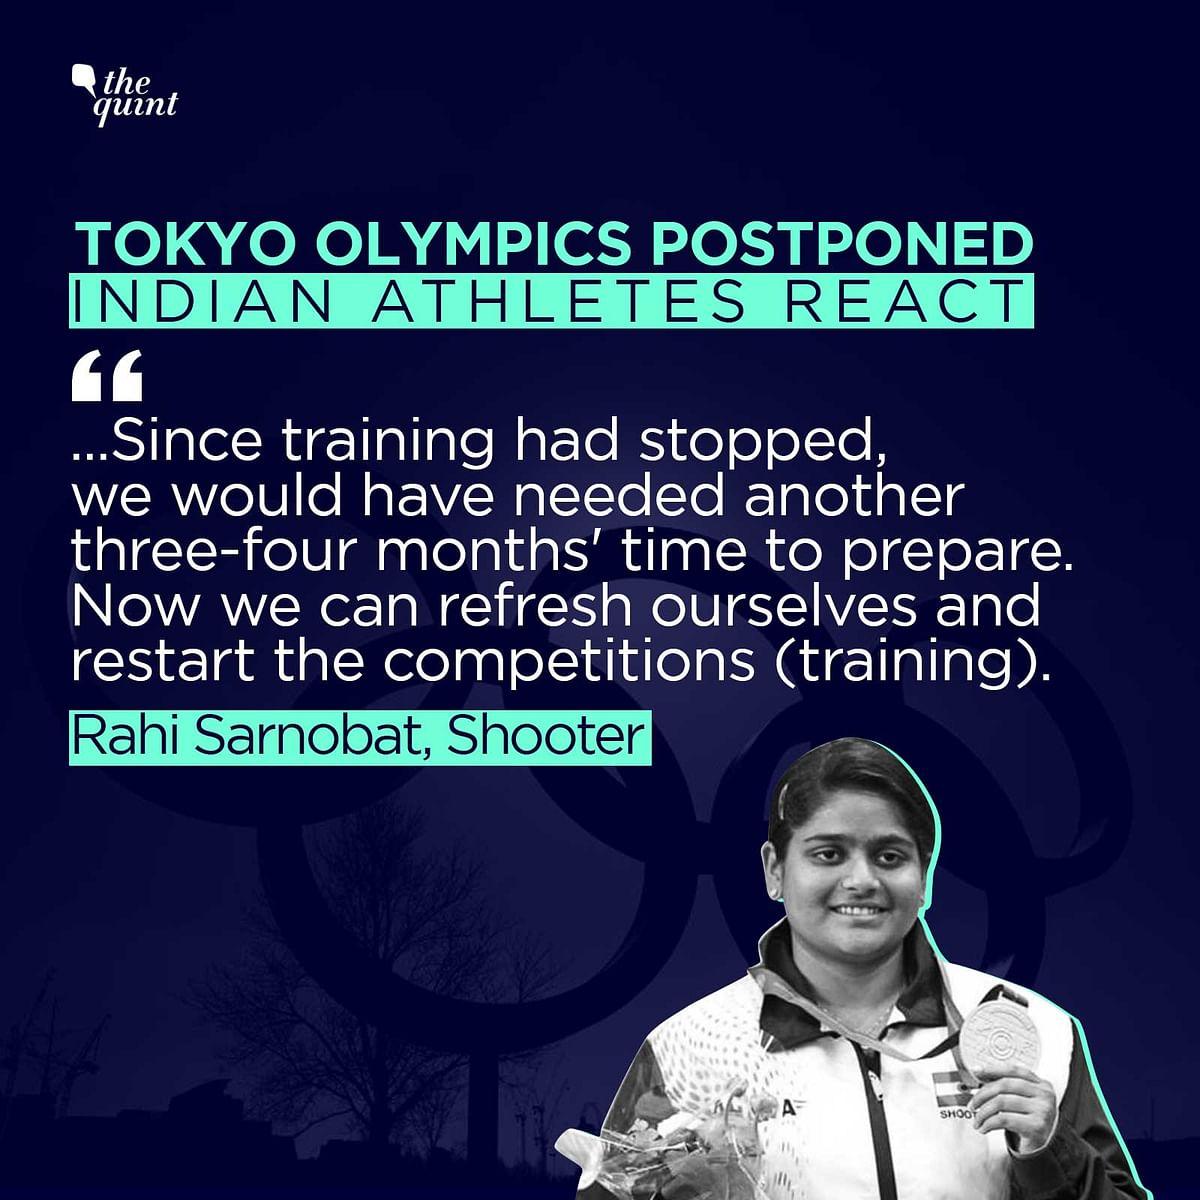 Life Comes First: India's Tokyo-Bound Athletes Hail Postponement